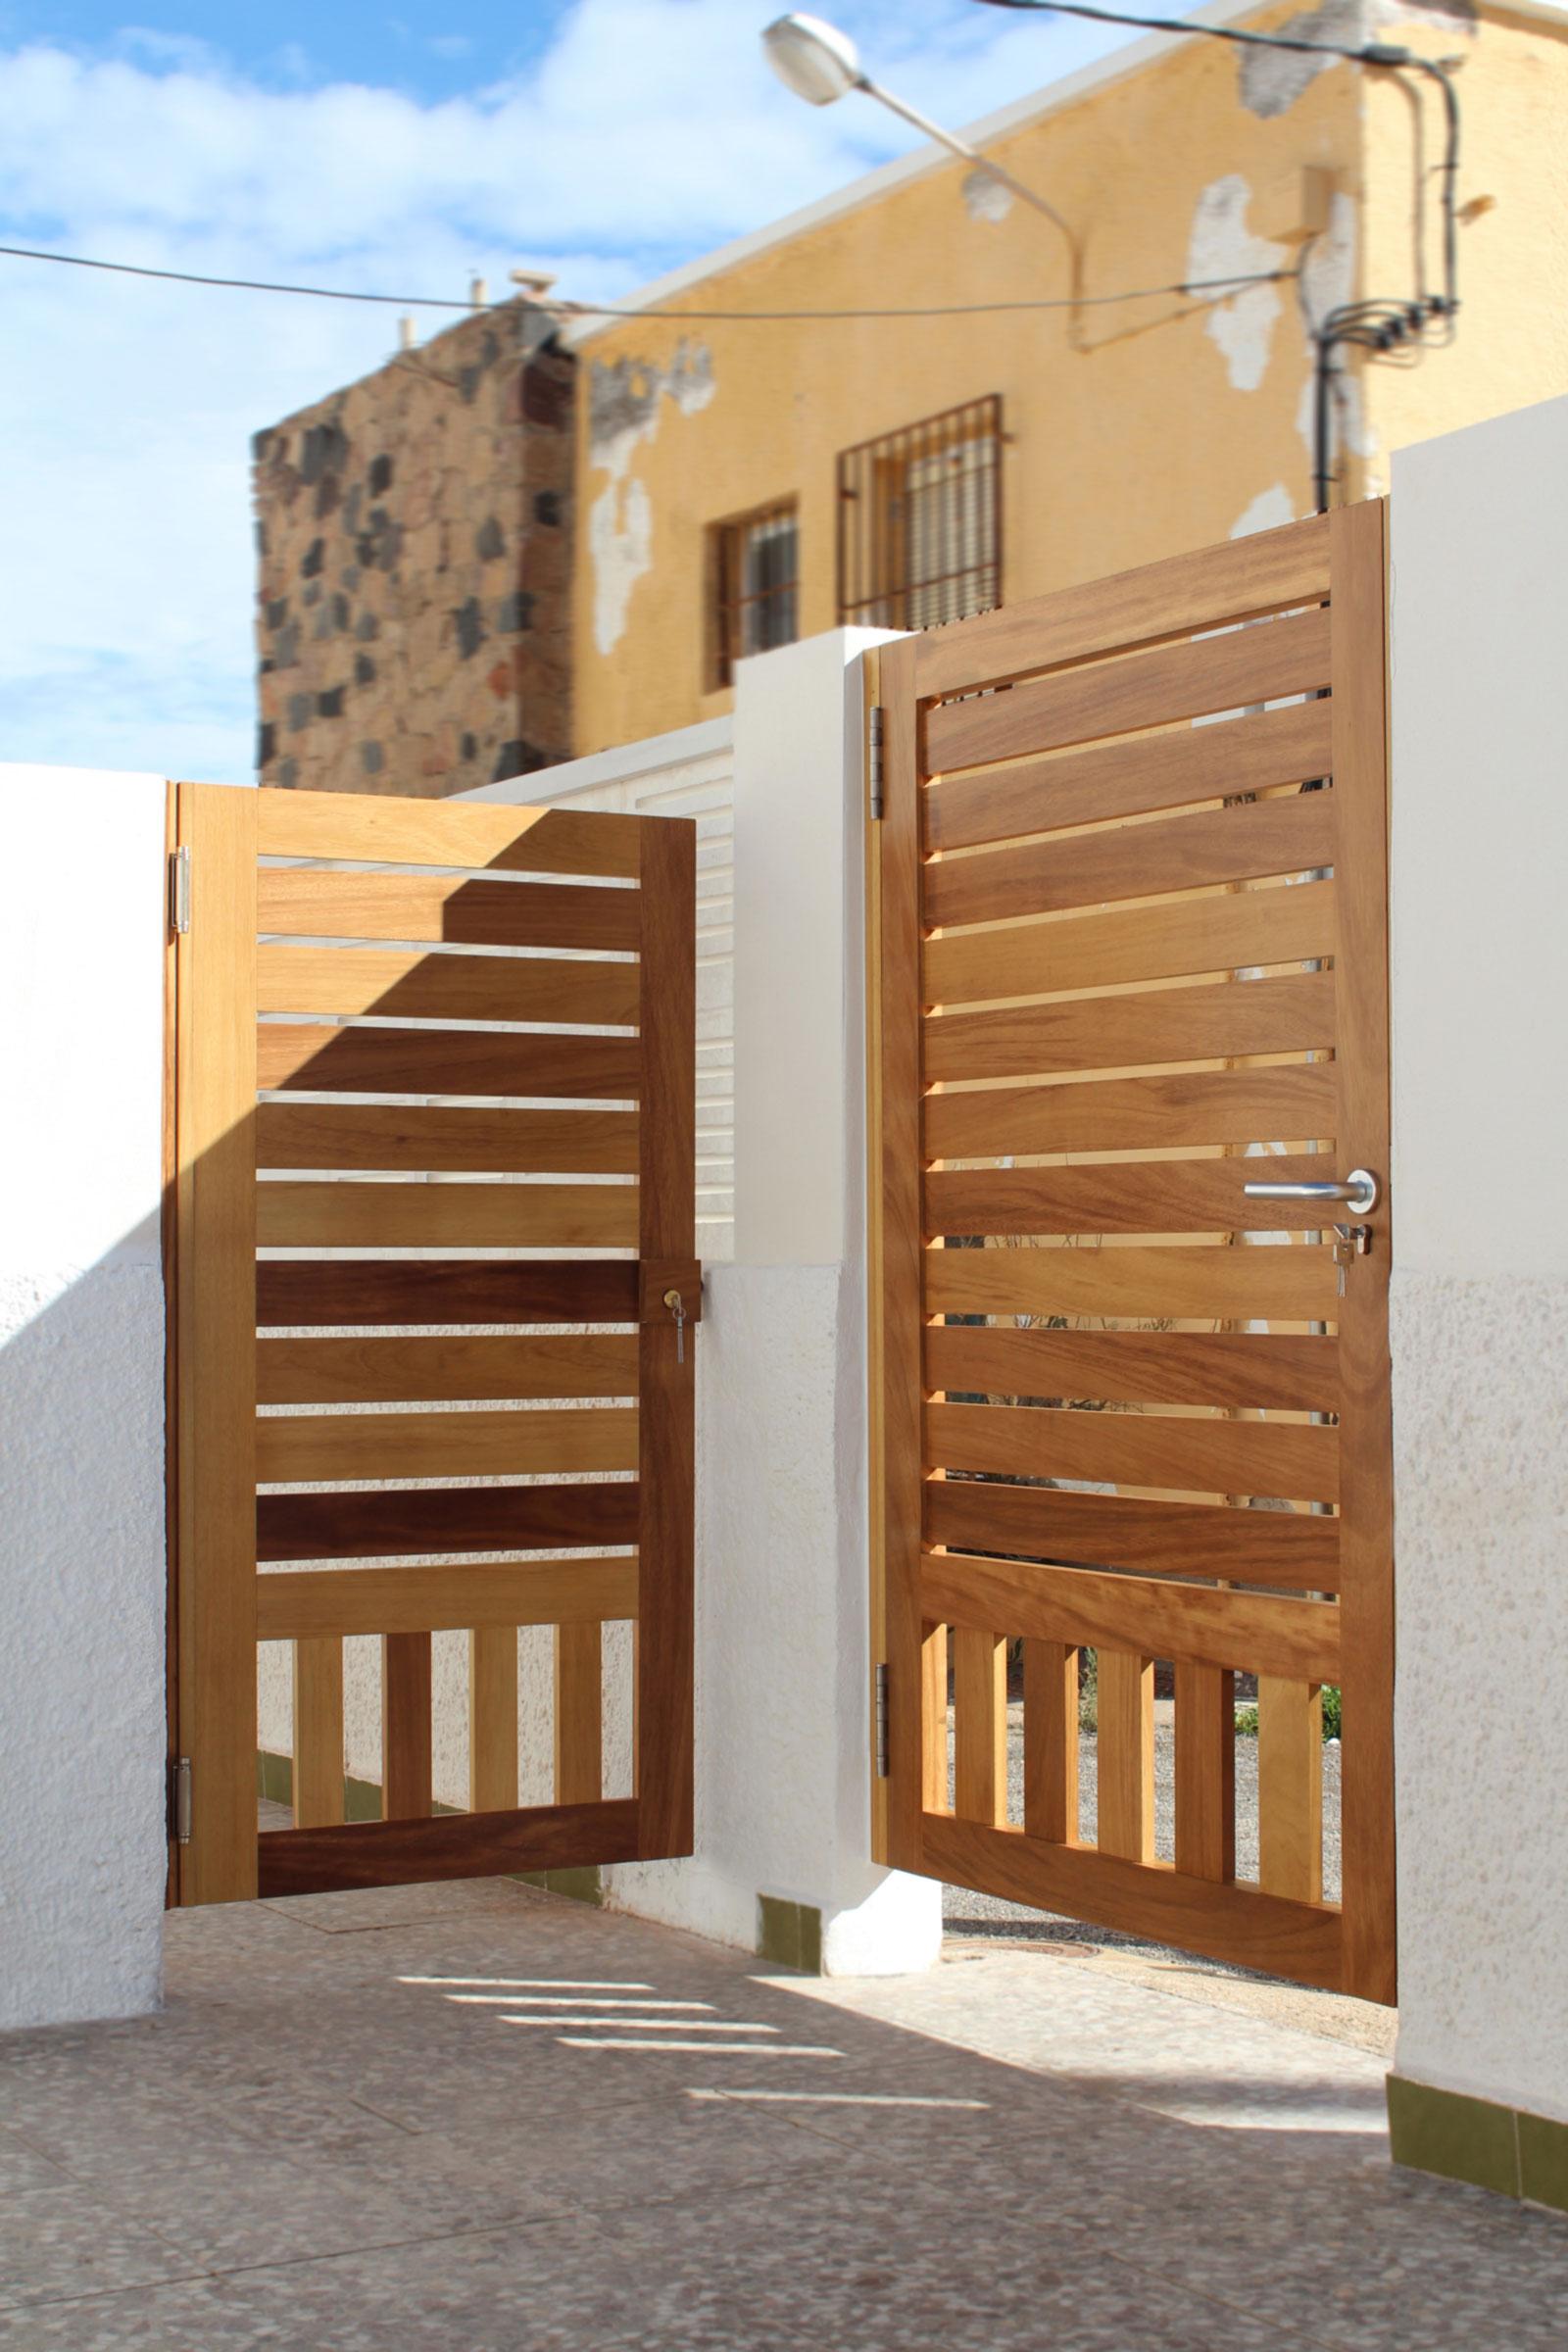 Puerta corredera guia exterior puertas correderas kit gua puerta corredera guia plata mate m - Puertas para porches ...